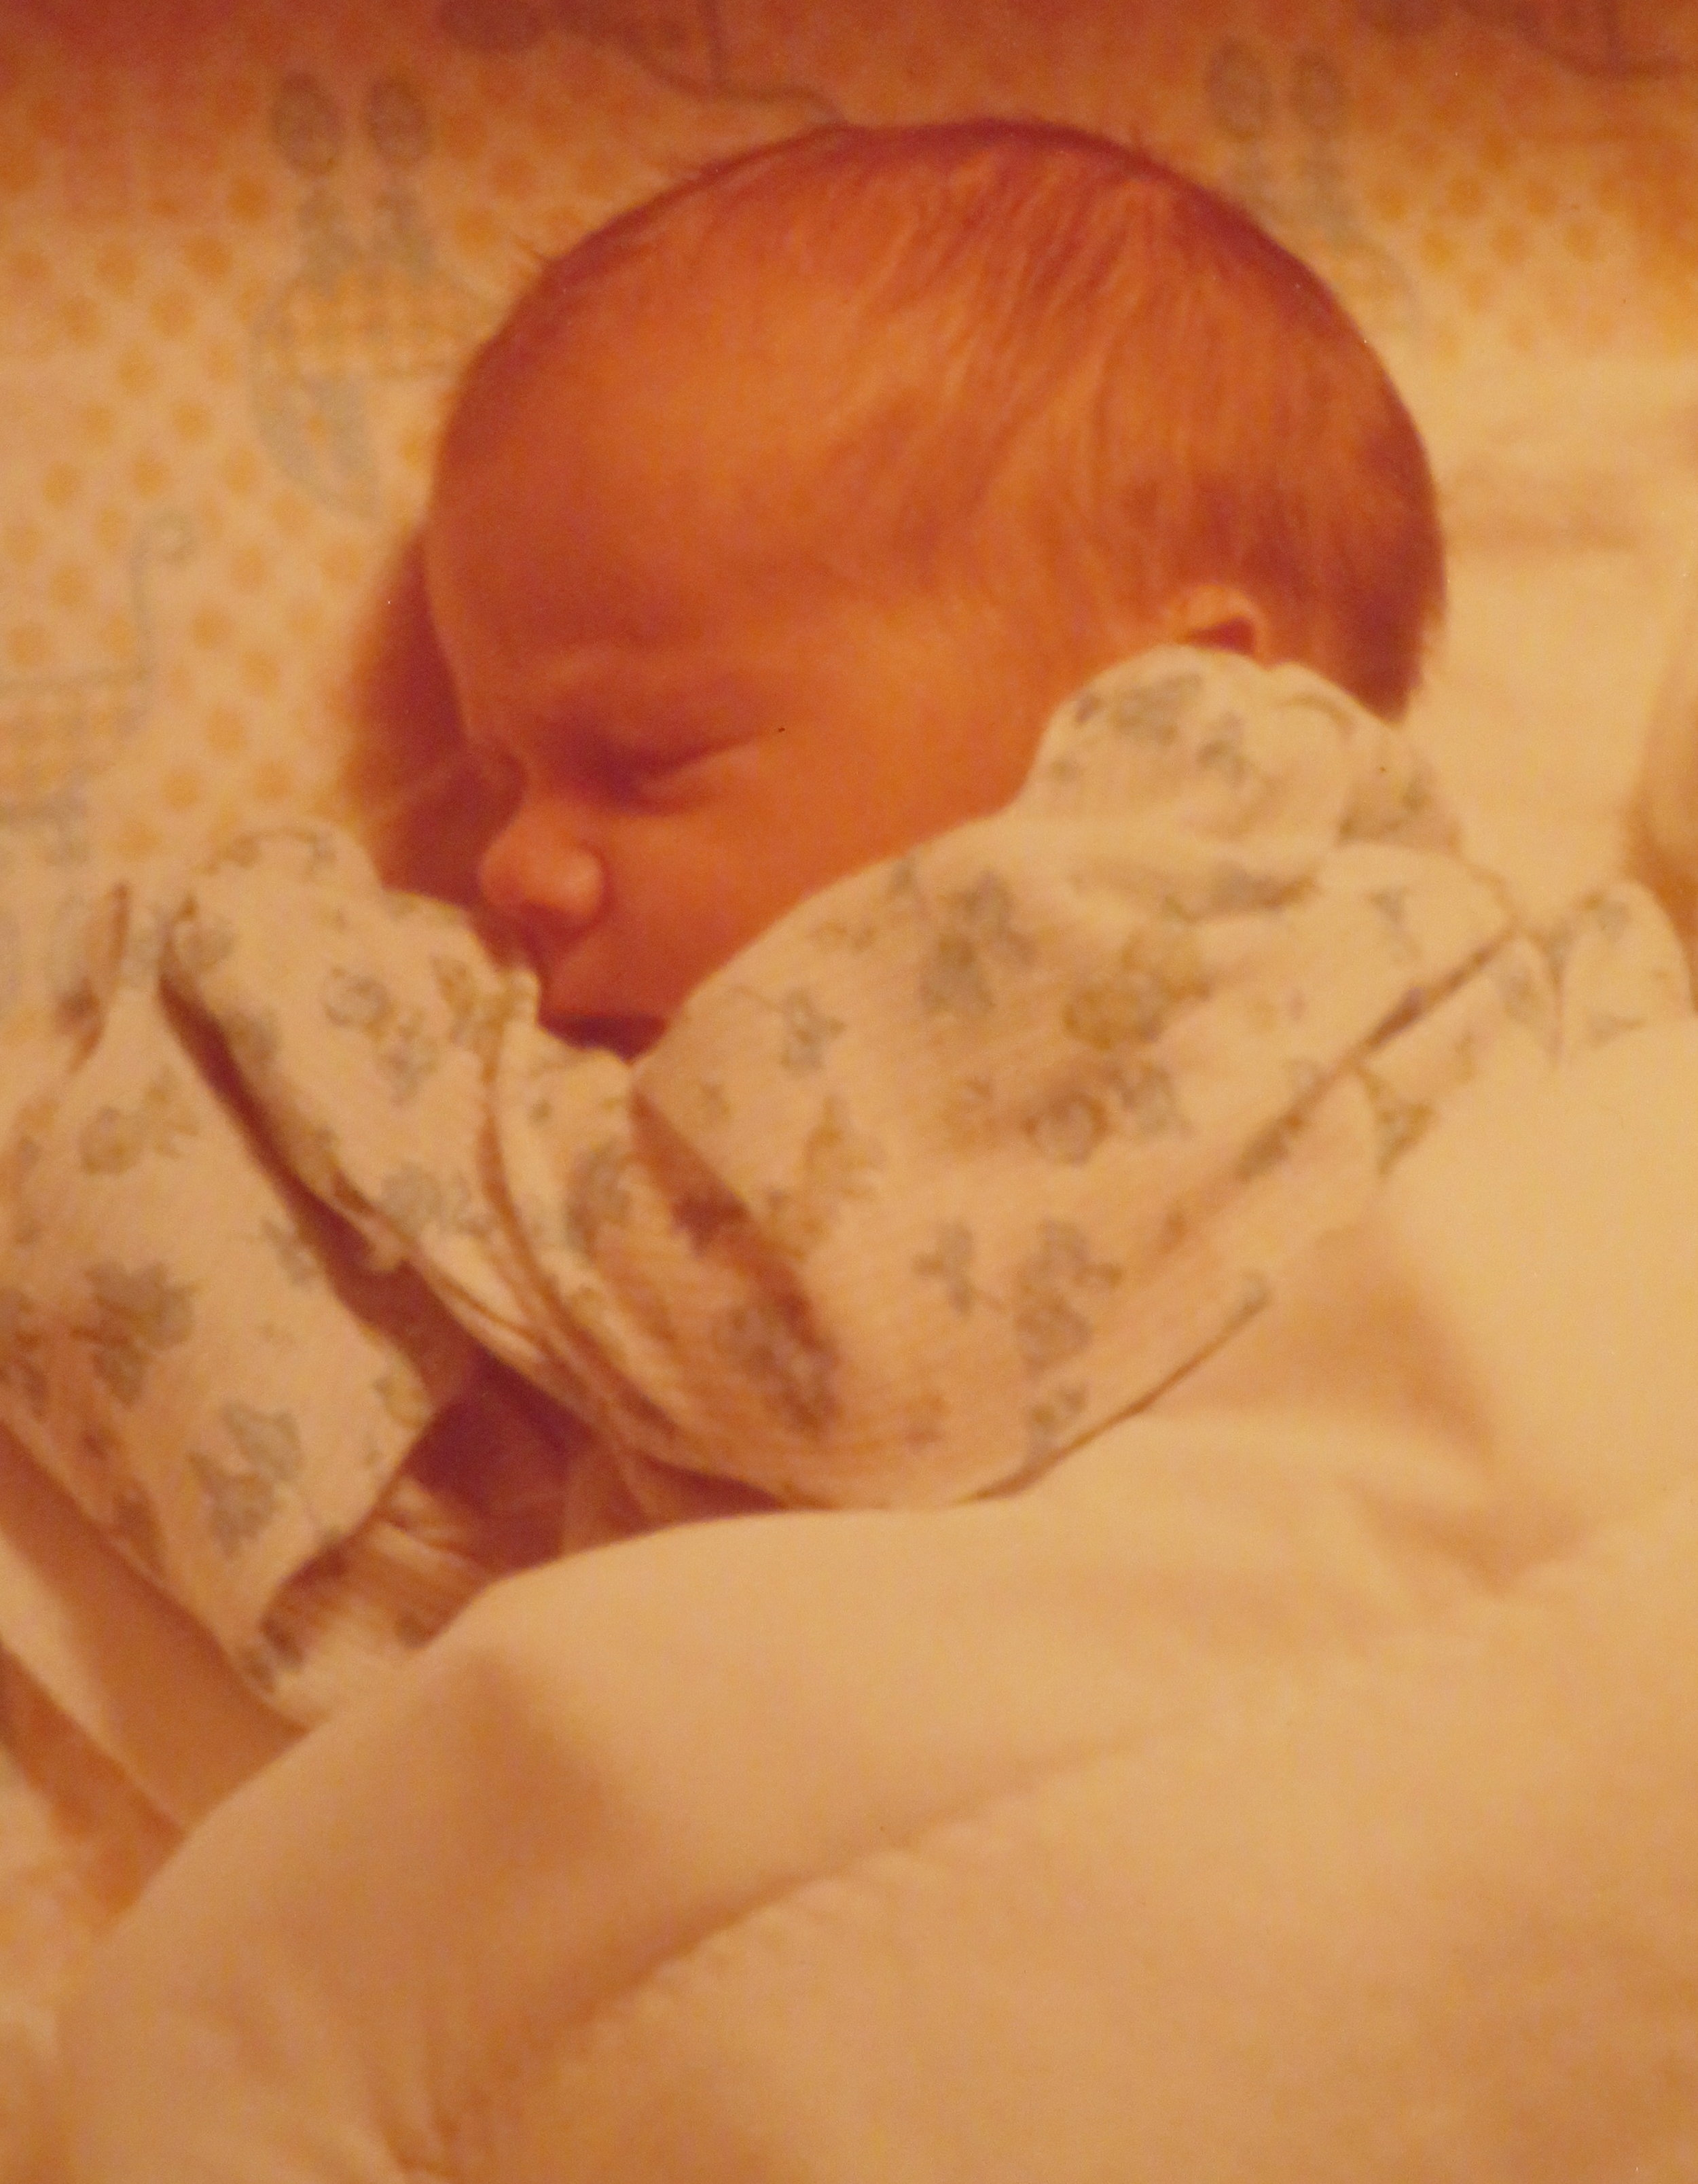 Newborn Brennan - February 1976